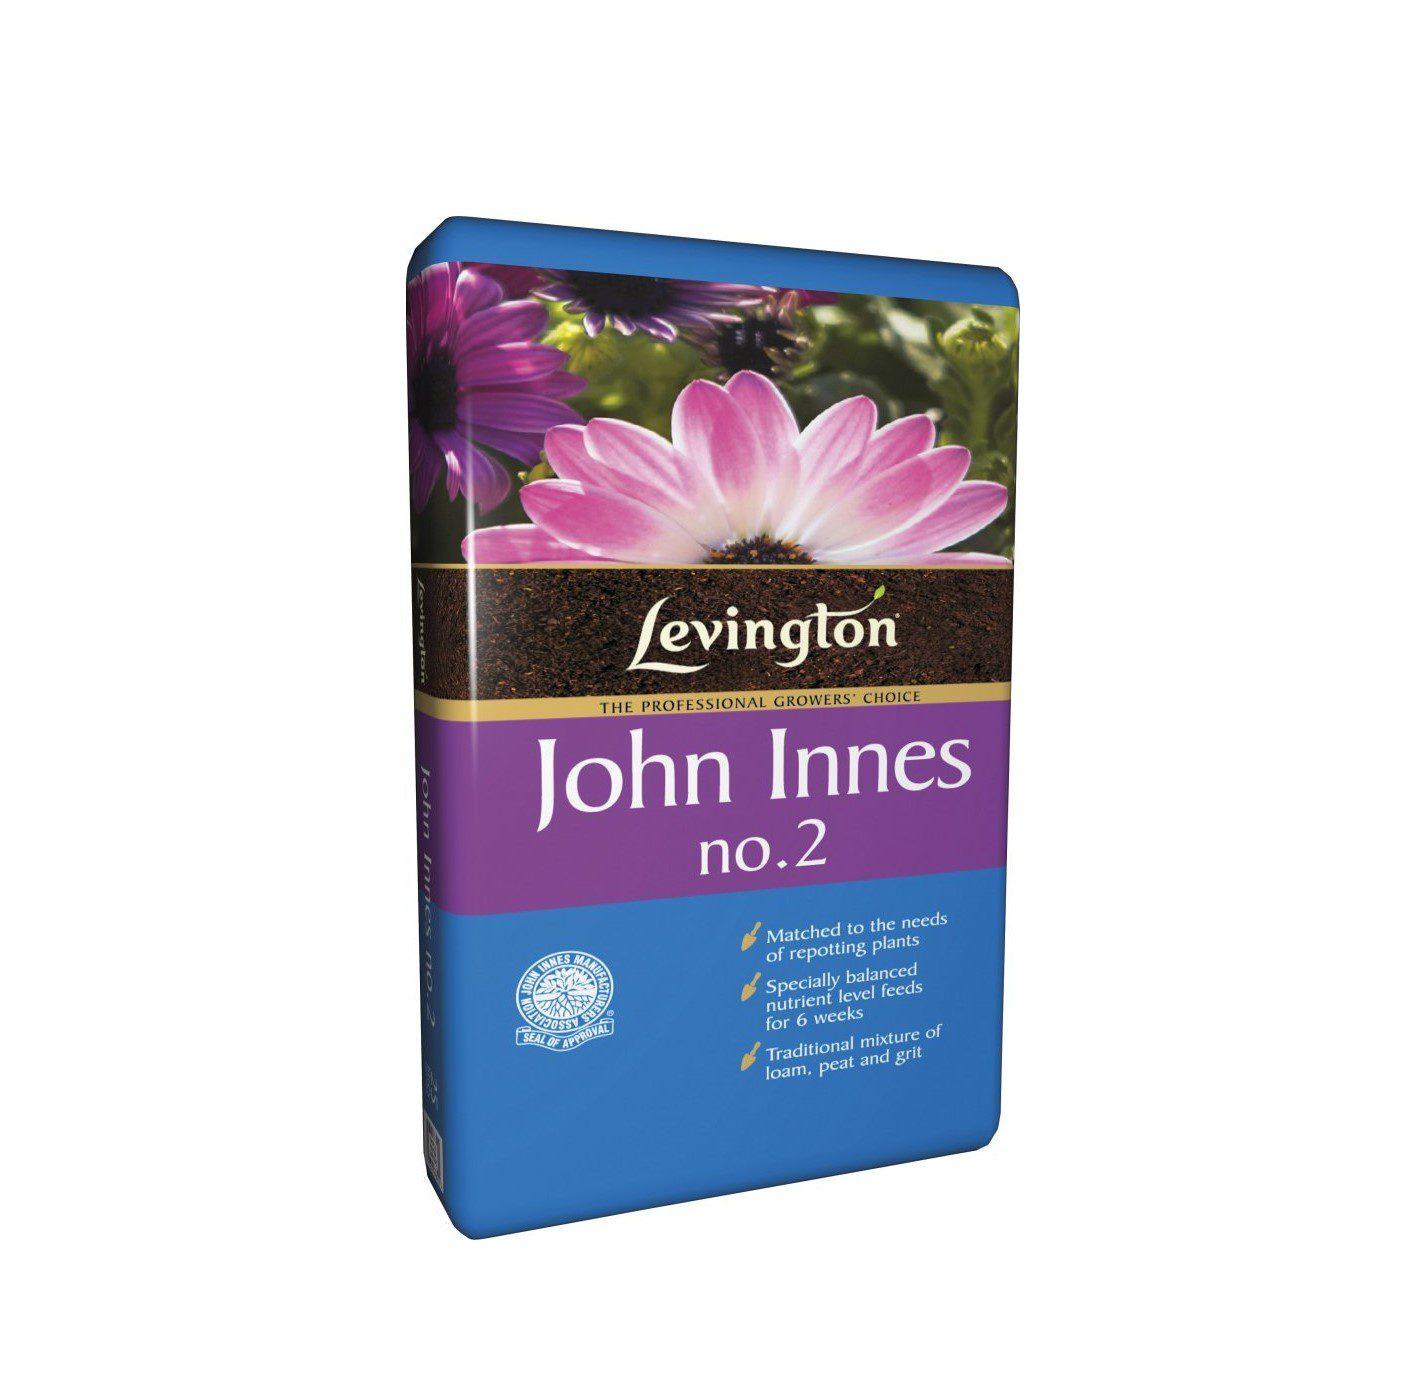 Levington John Innes number 2 compost